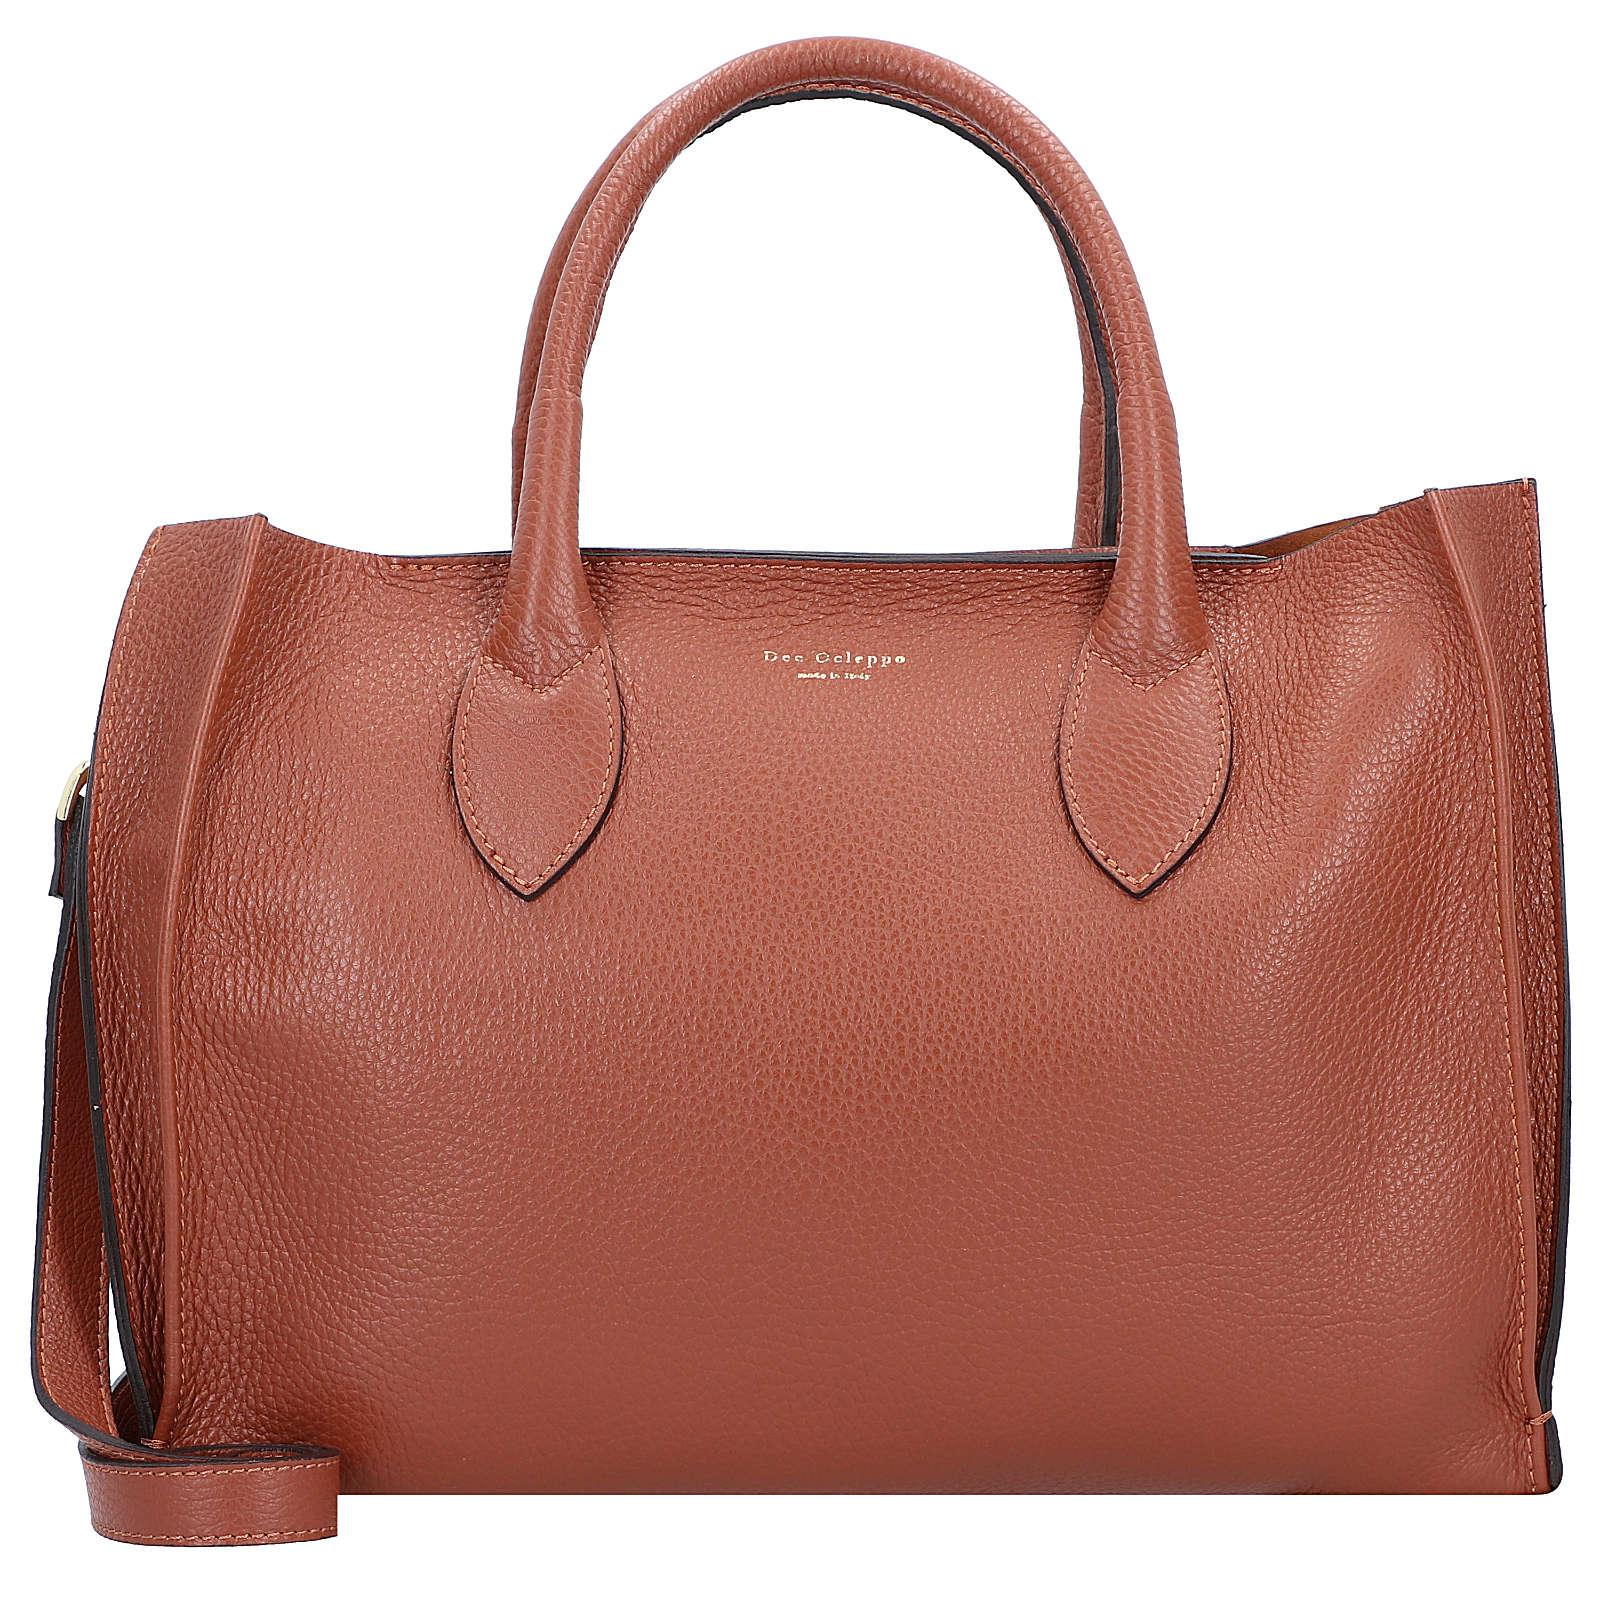 Dee Ocleppo Handtasche Leder 35 cm Handtaschen braun Damen